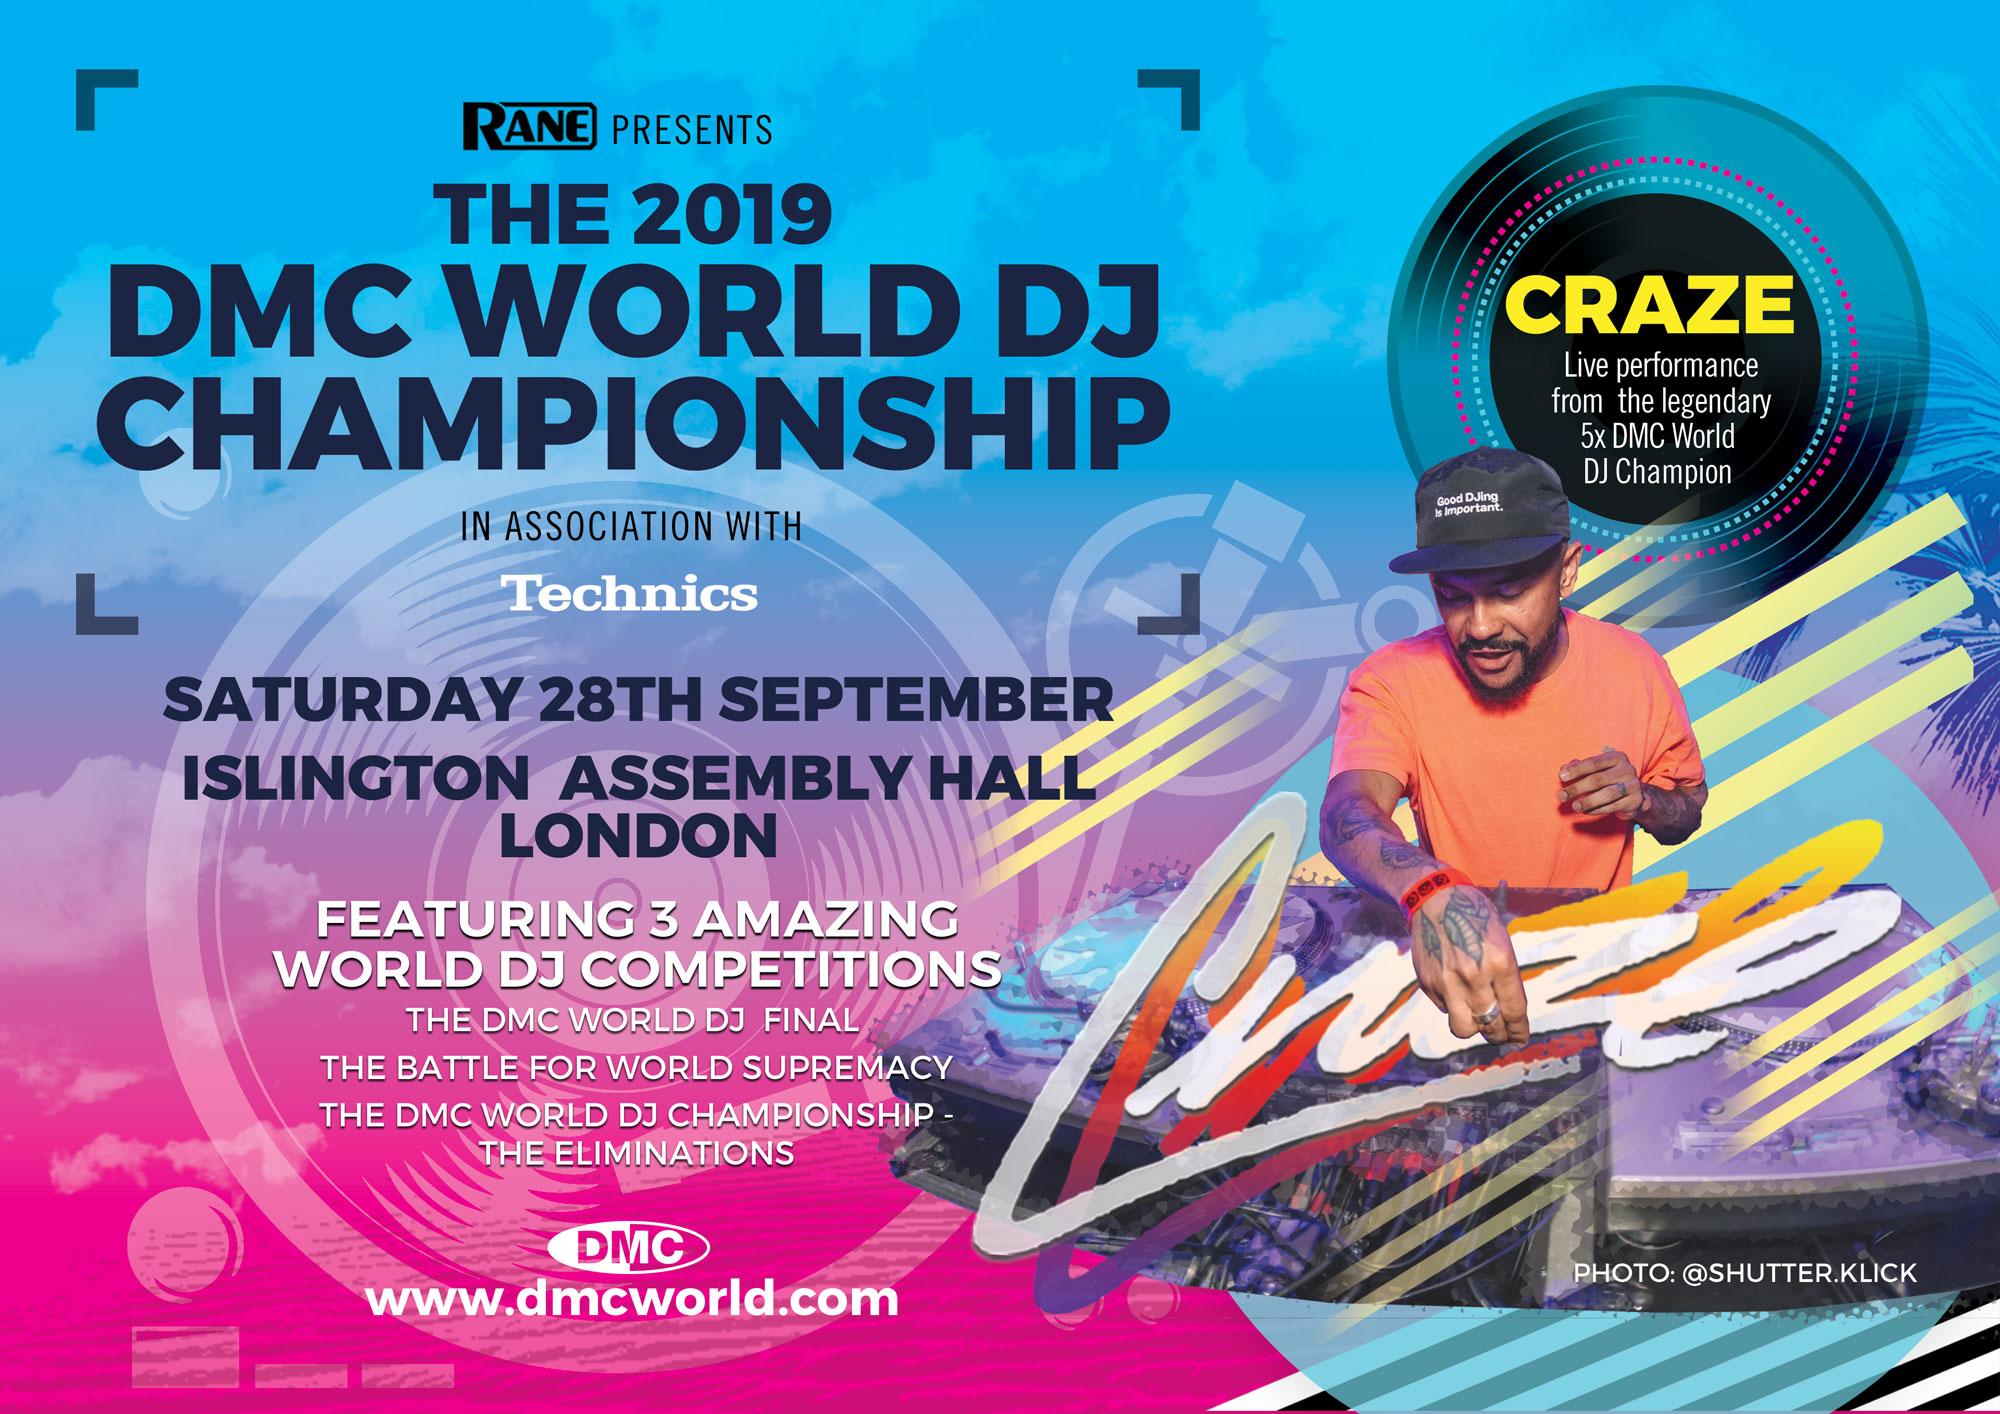 DMC World DJ Championship Finals 2019, Islington